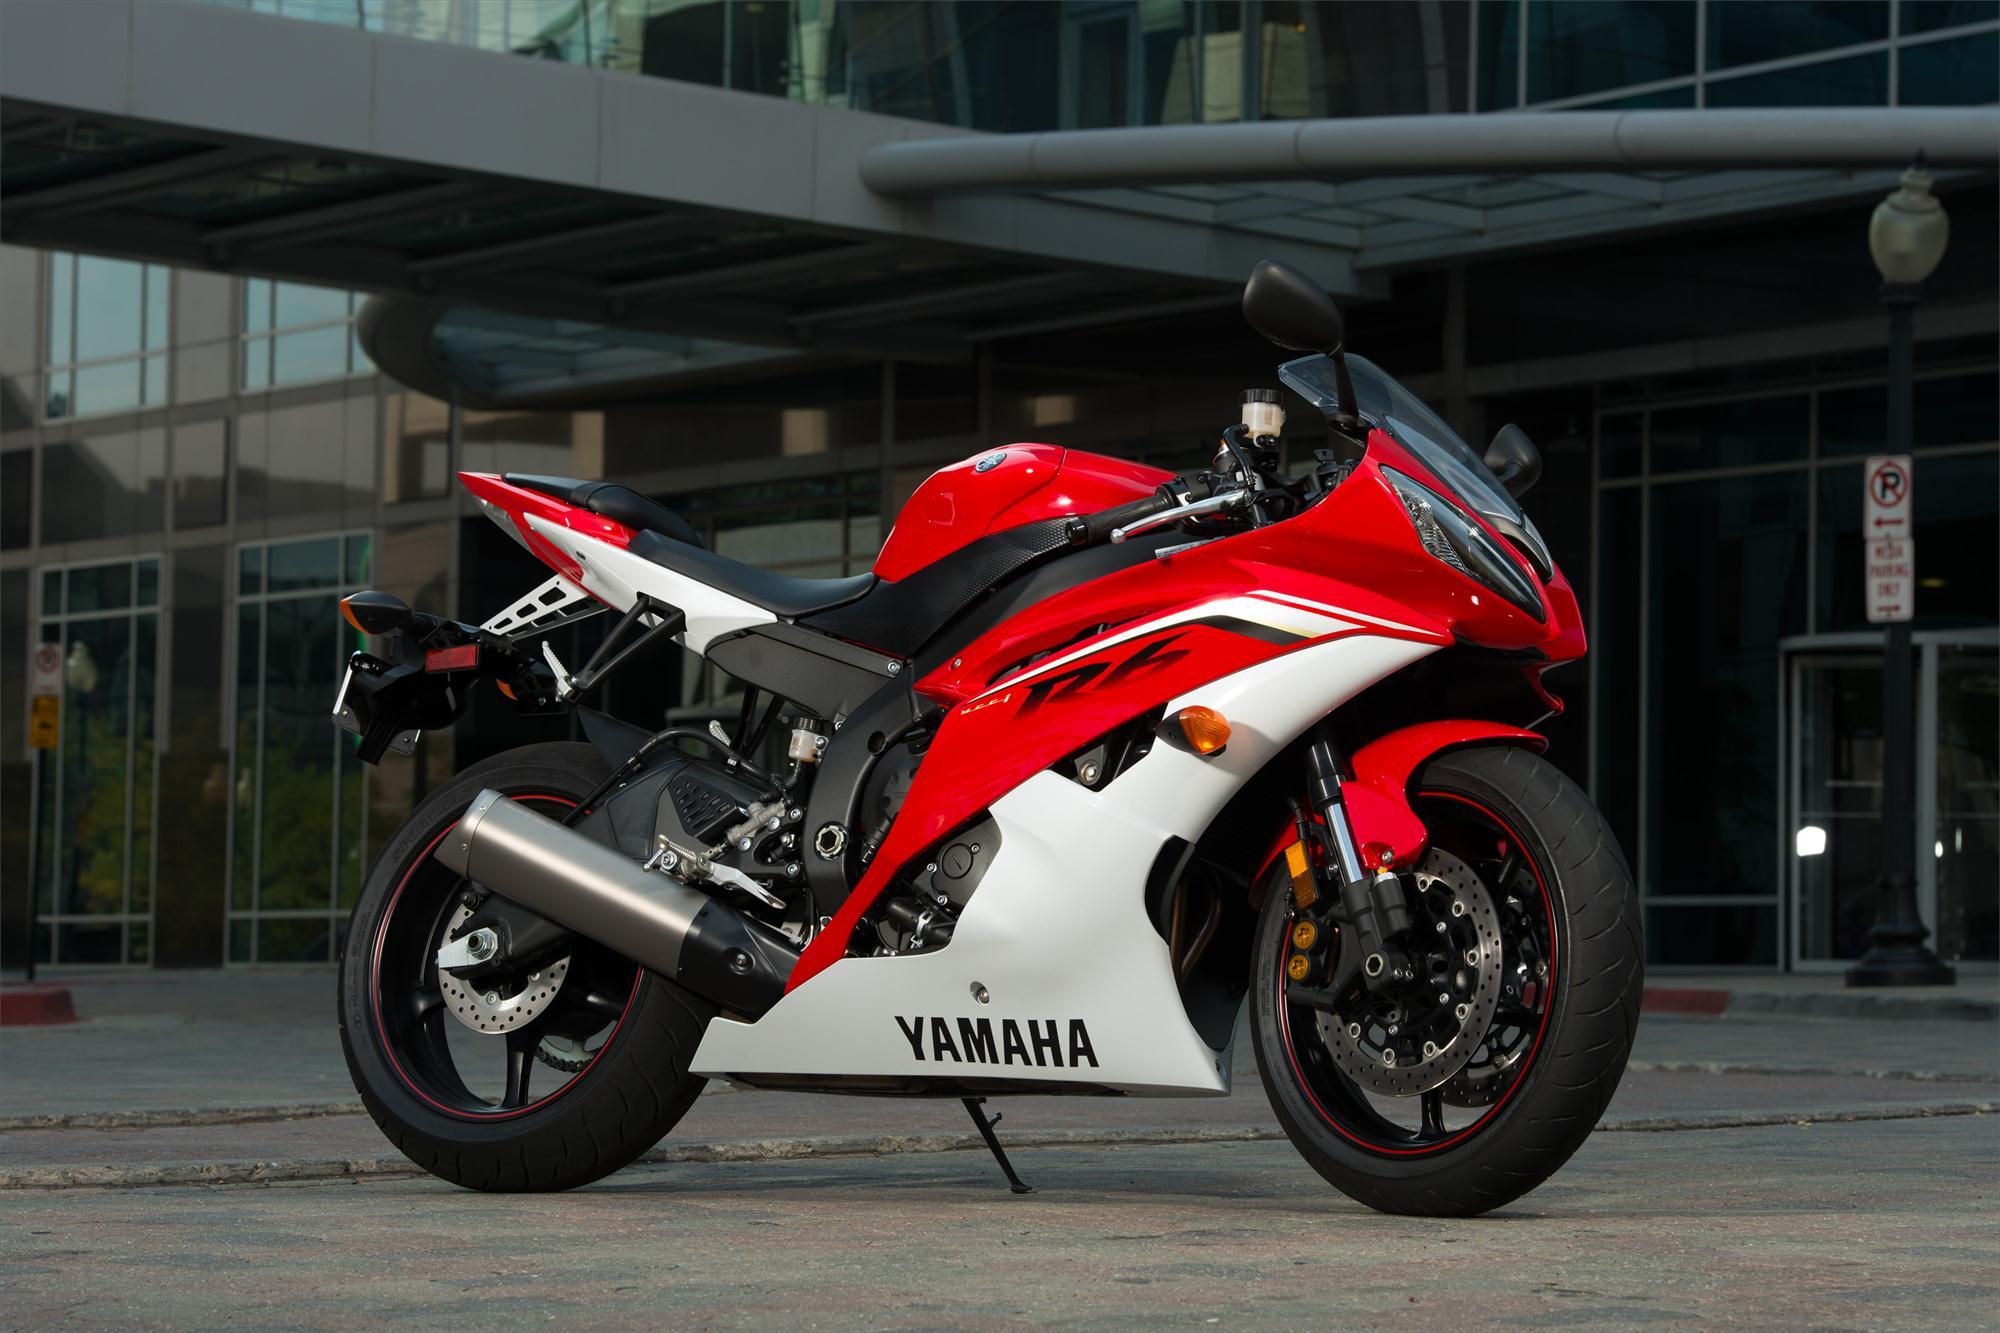 2013 Yamaha YZF R6